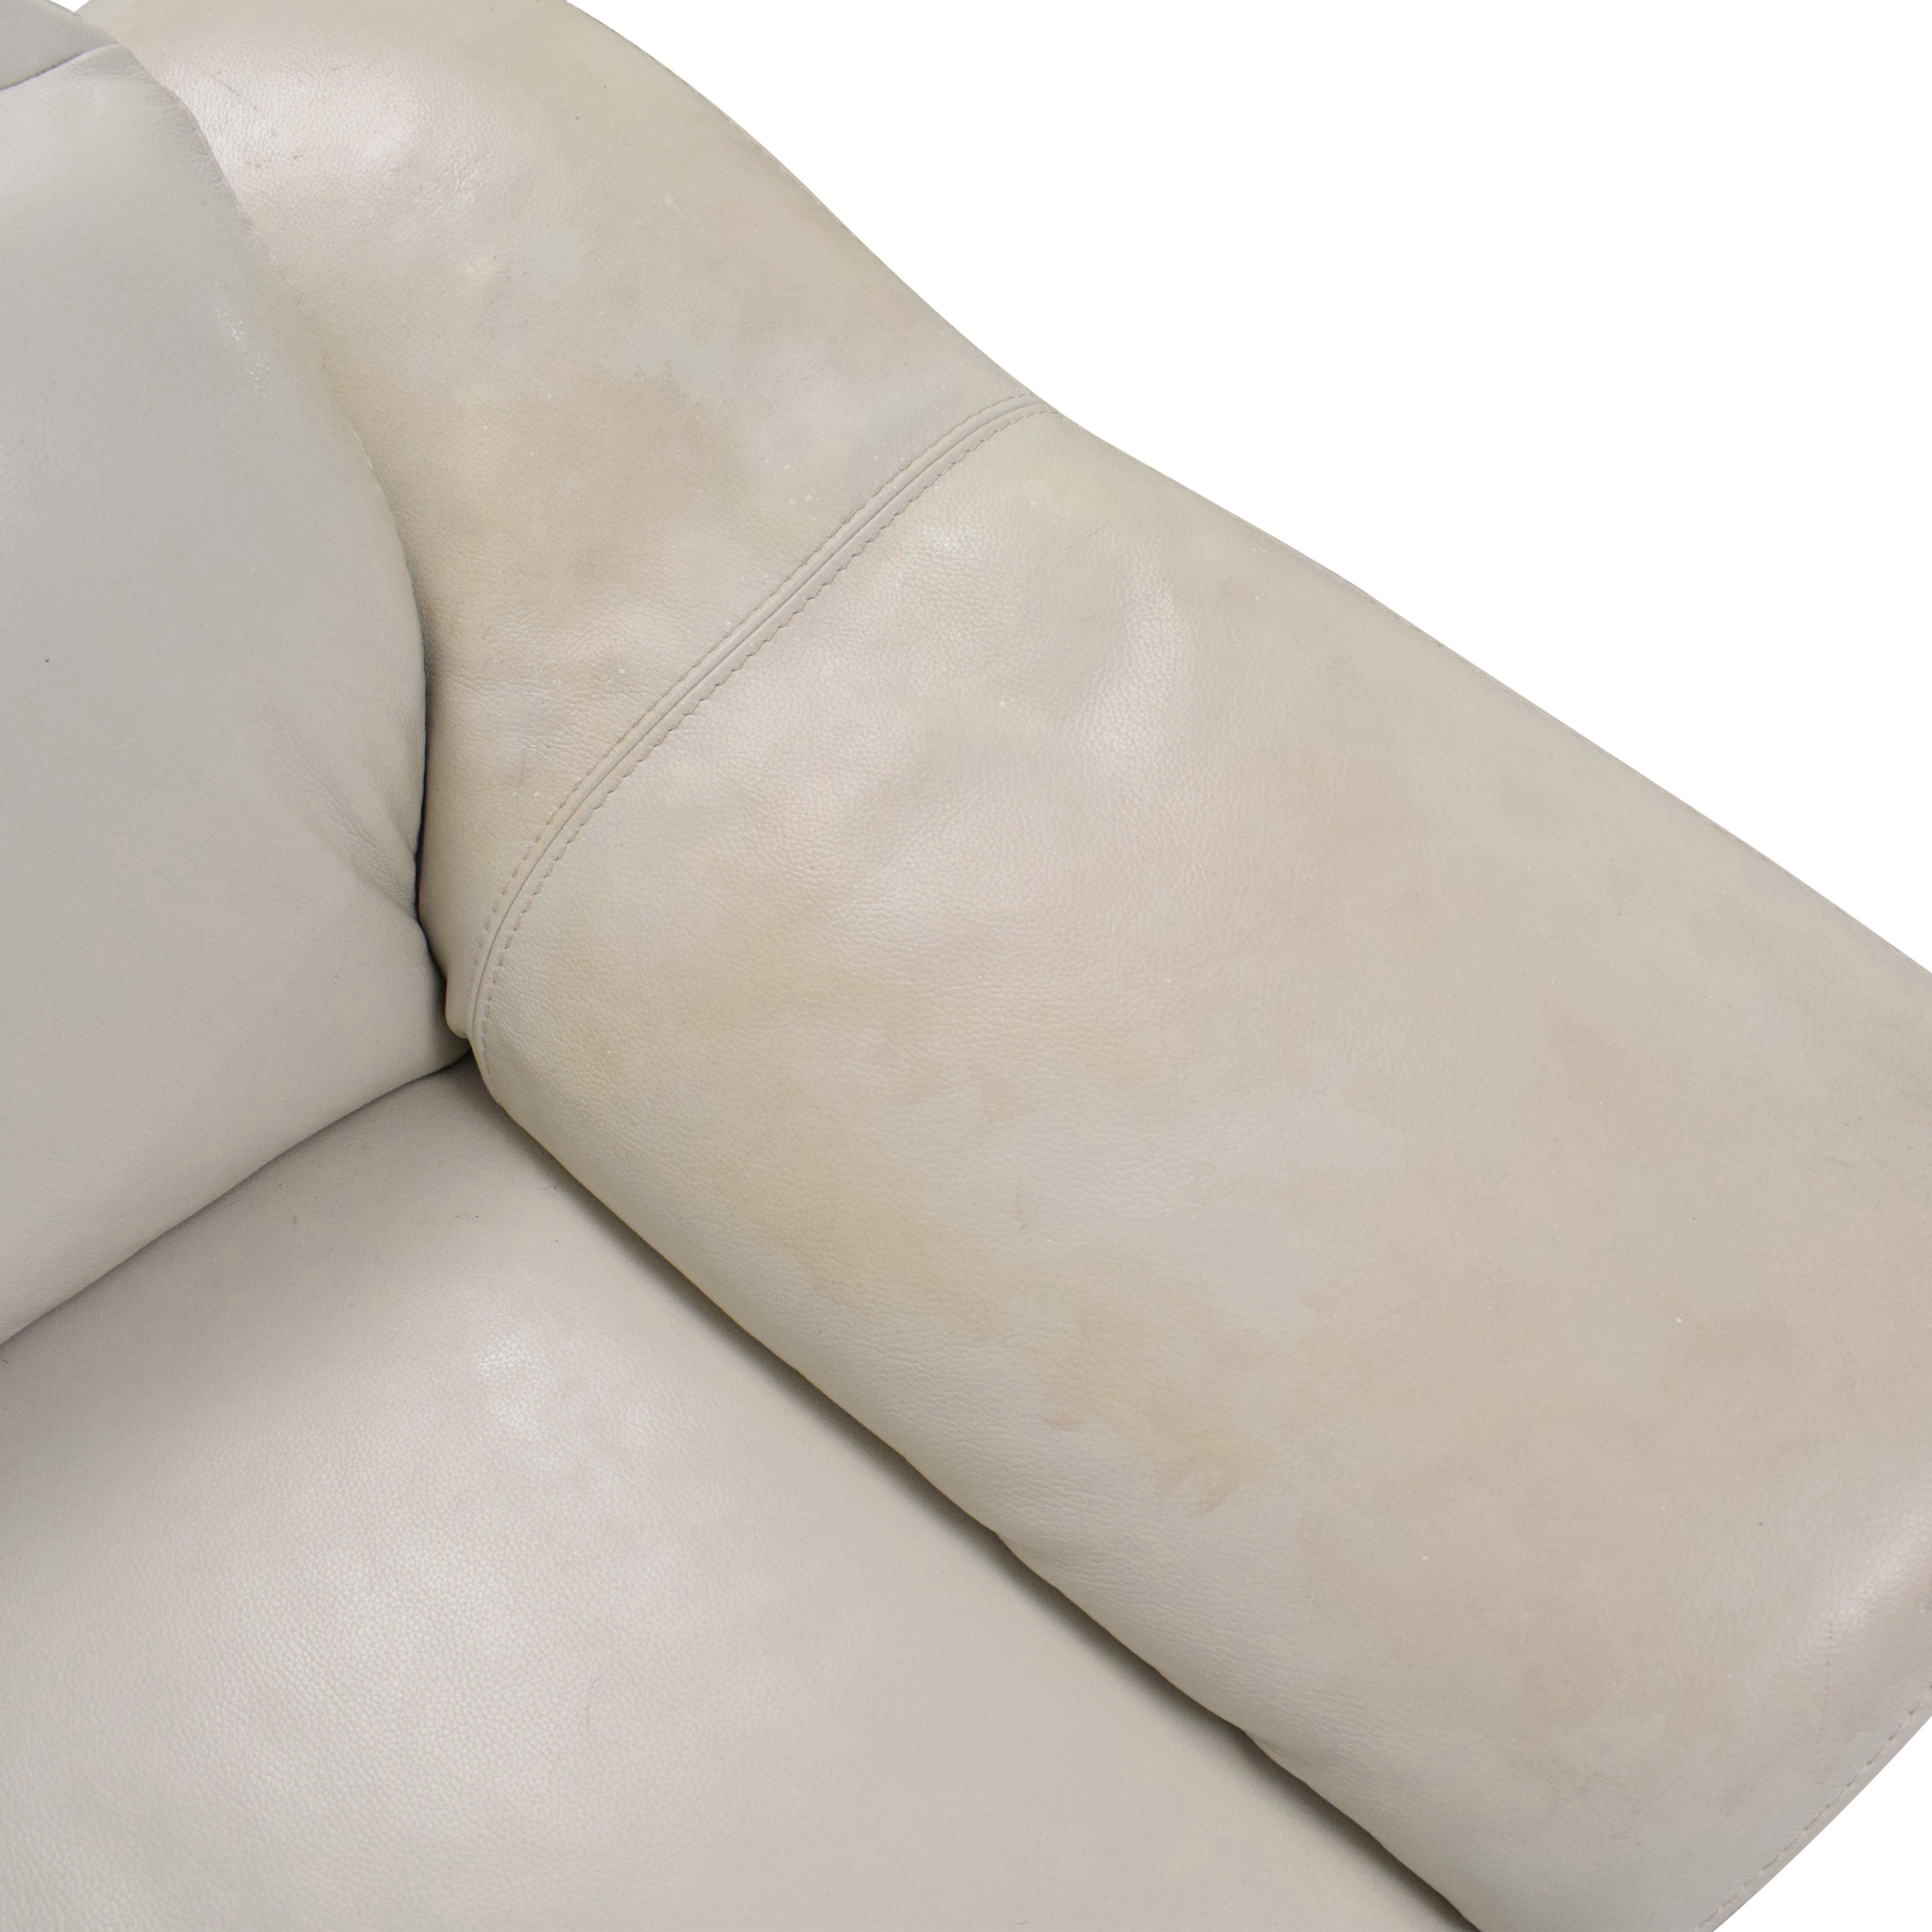 Macy's Macy's Power Reclining Sectional Sofa price